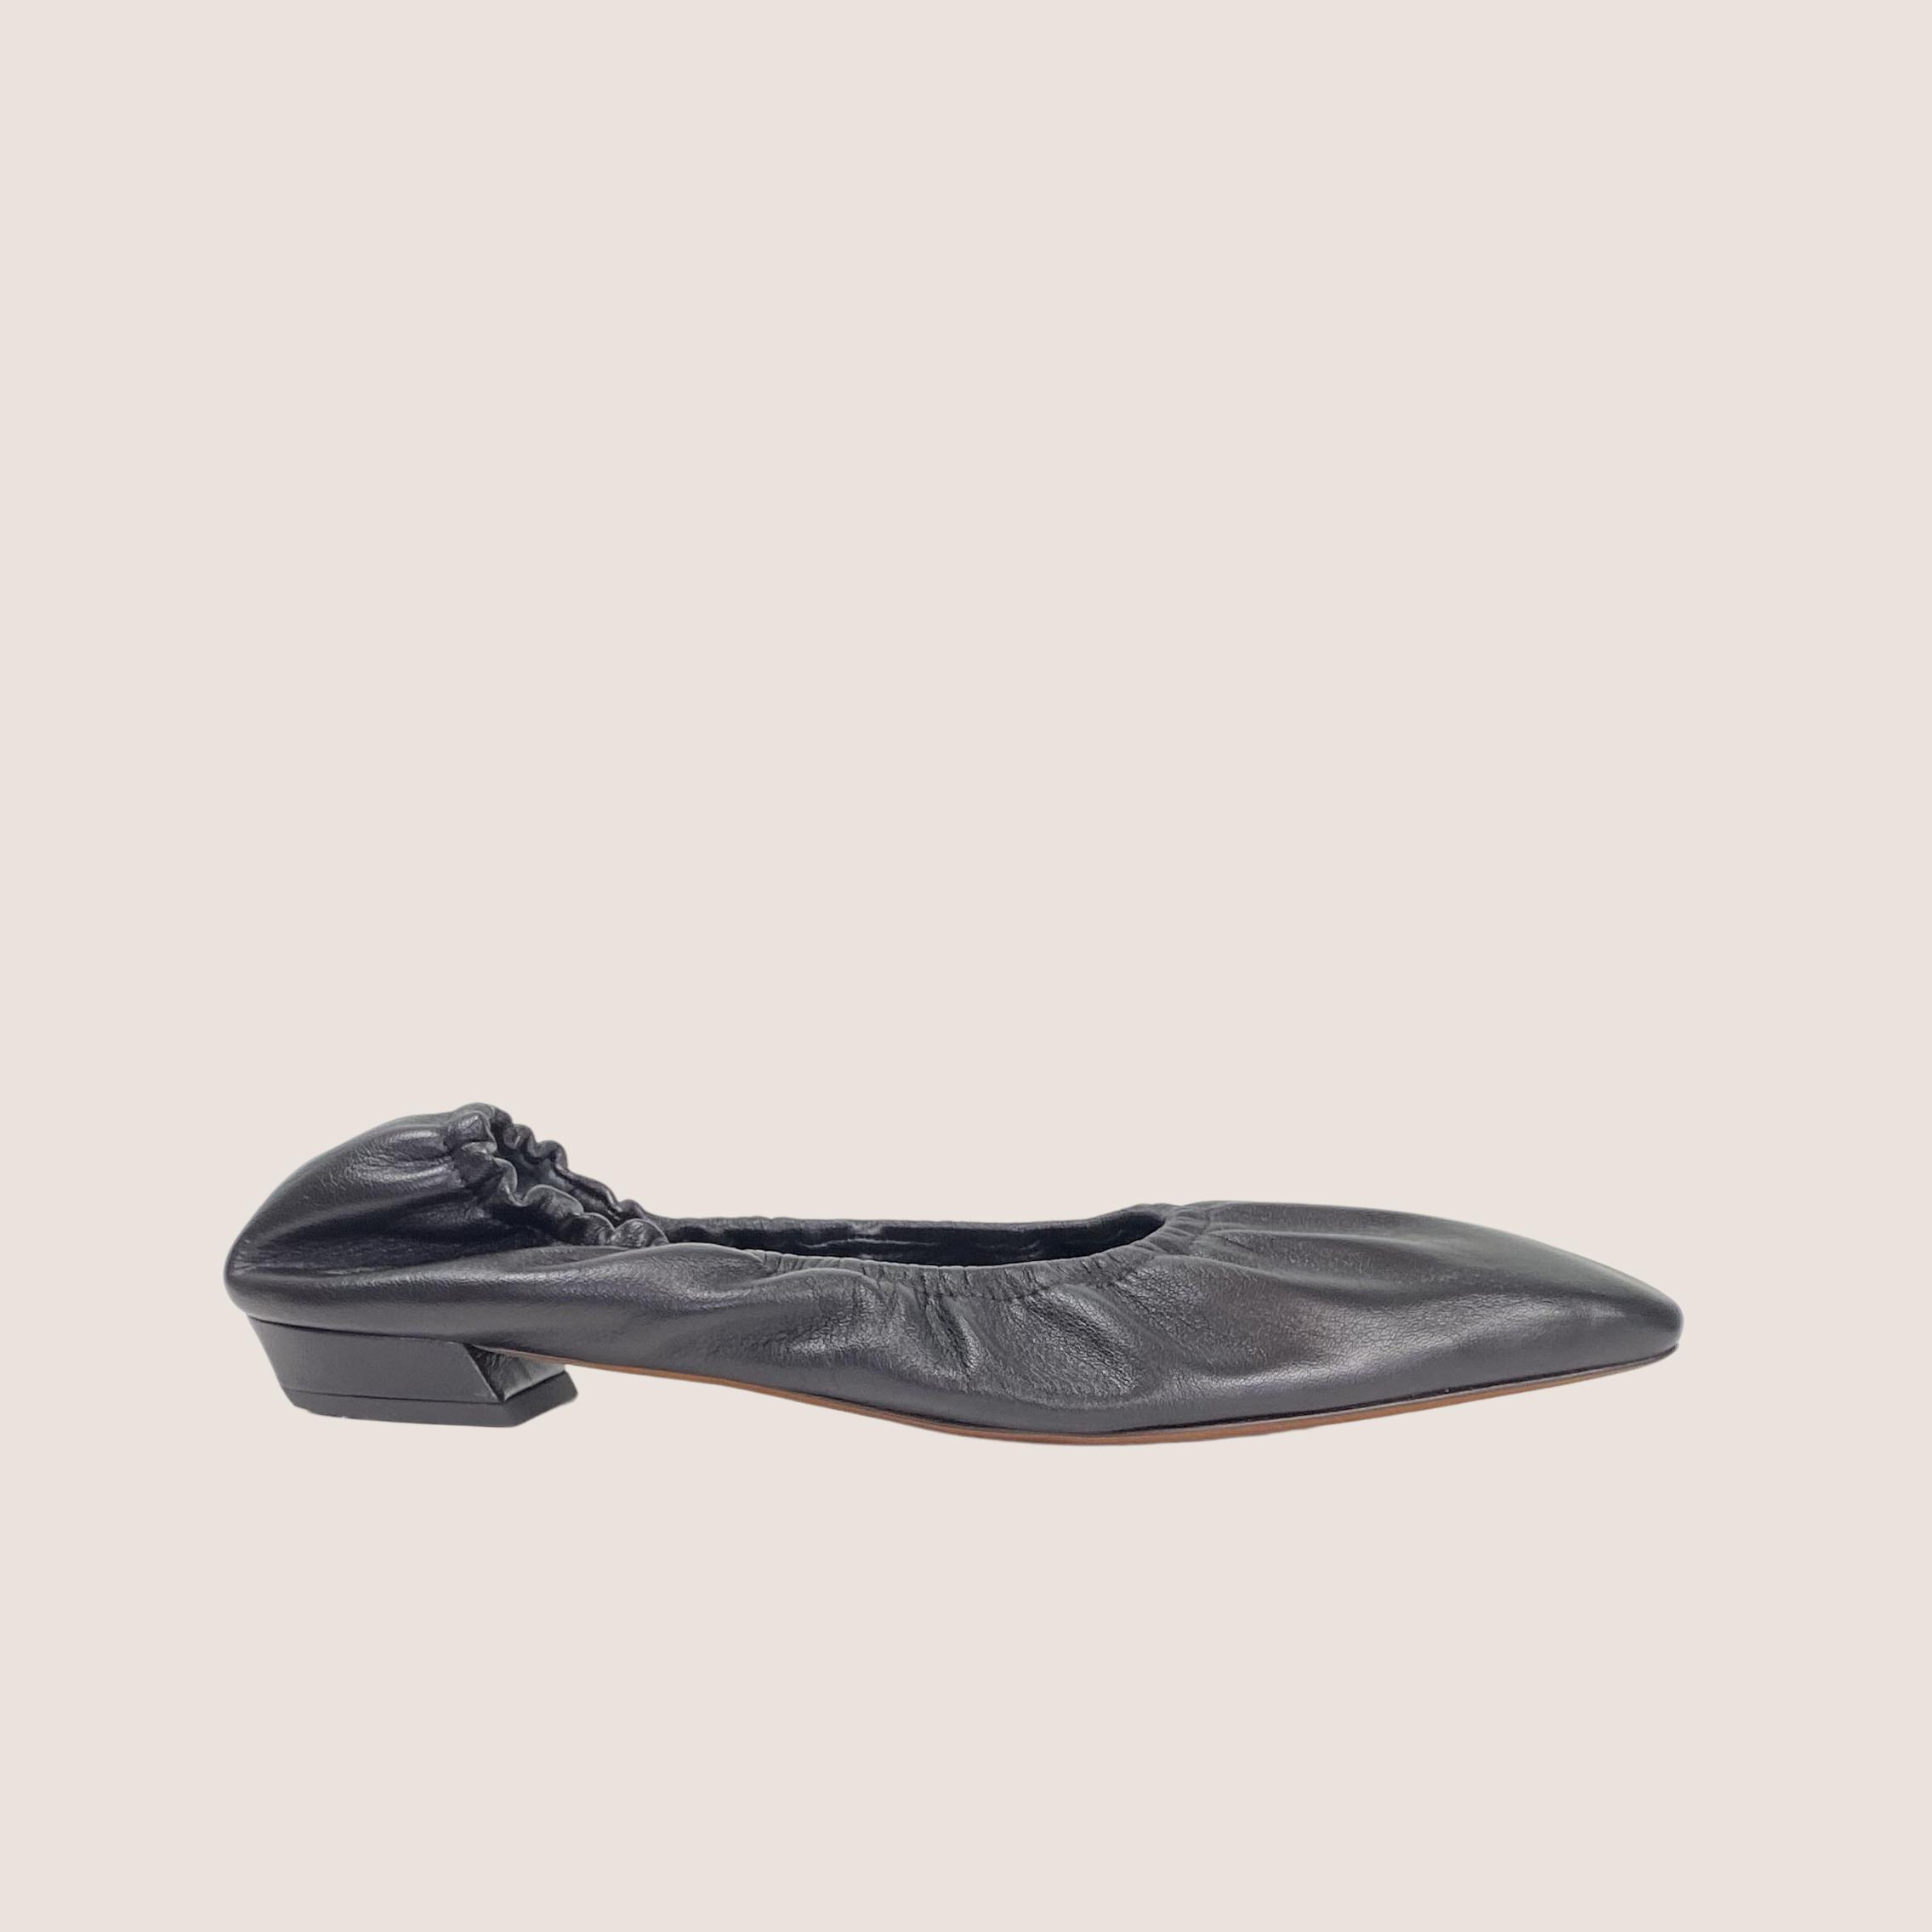 Ruched Ballet Flats